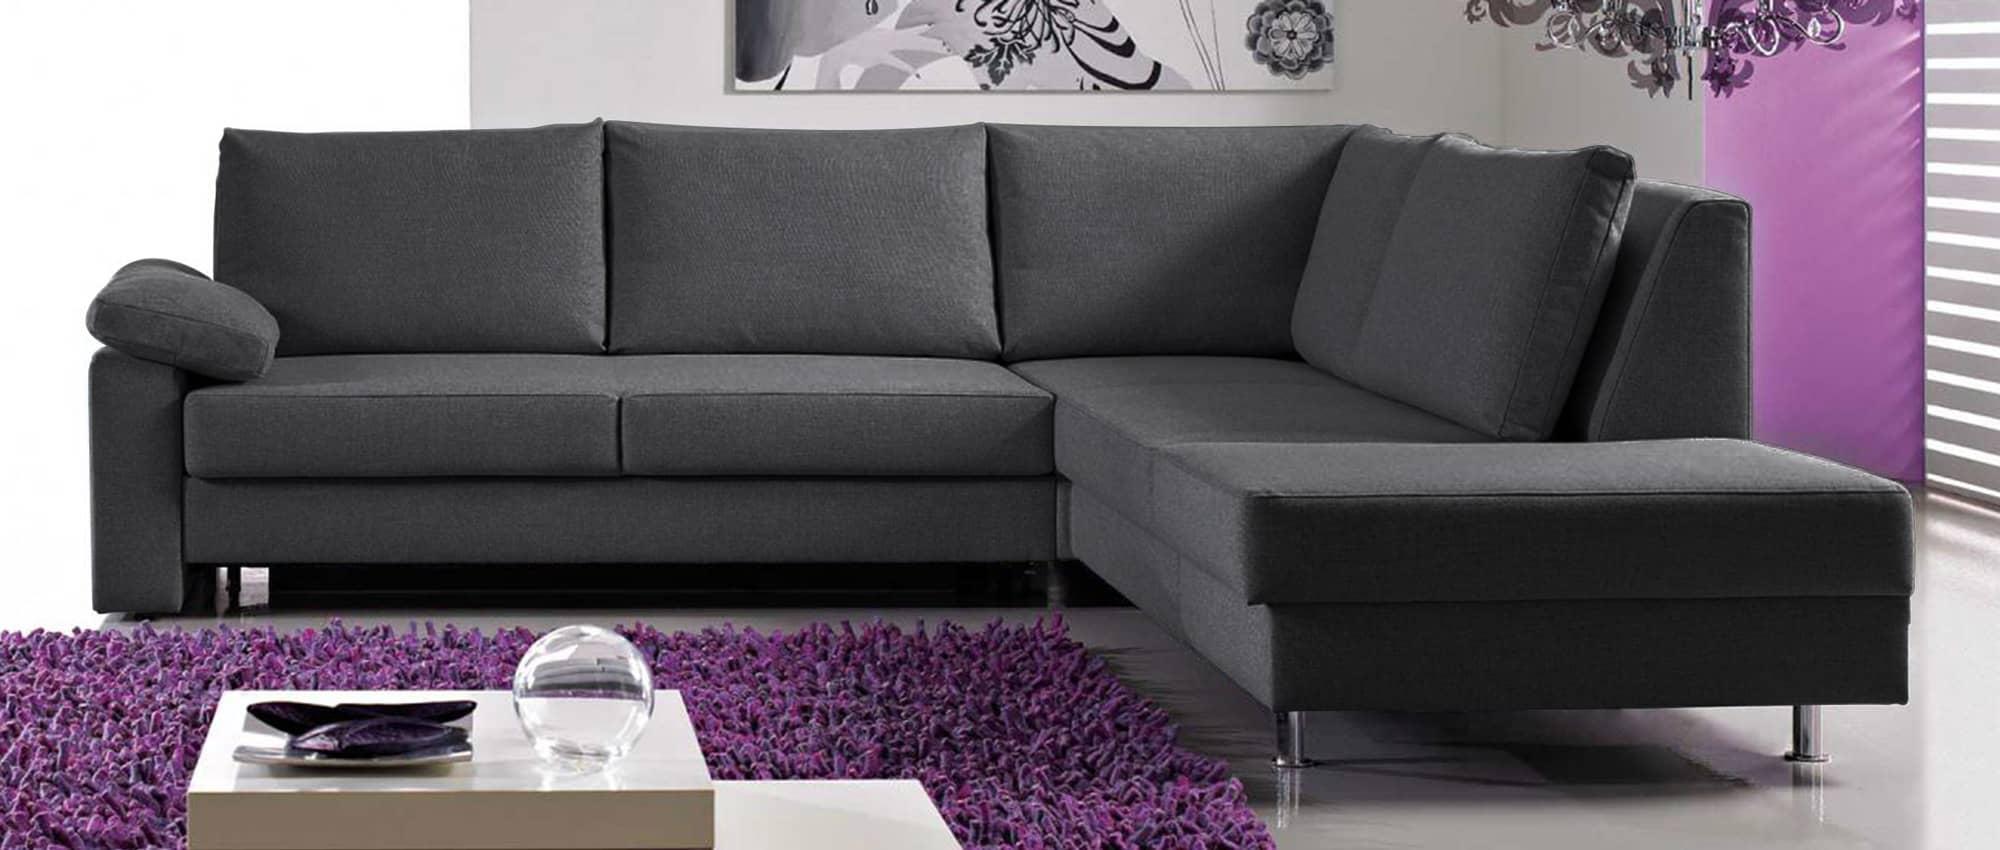 Bettsofa berlin interesting awesome innovation sofa for Innovation sofa berlin